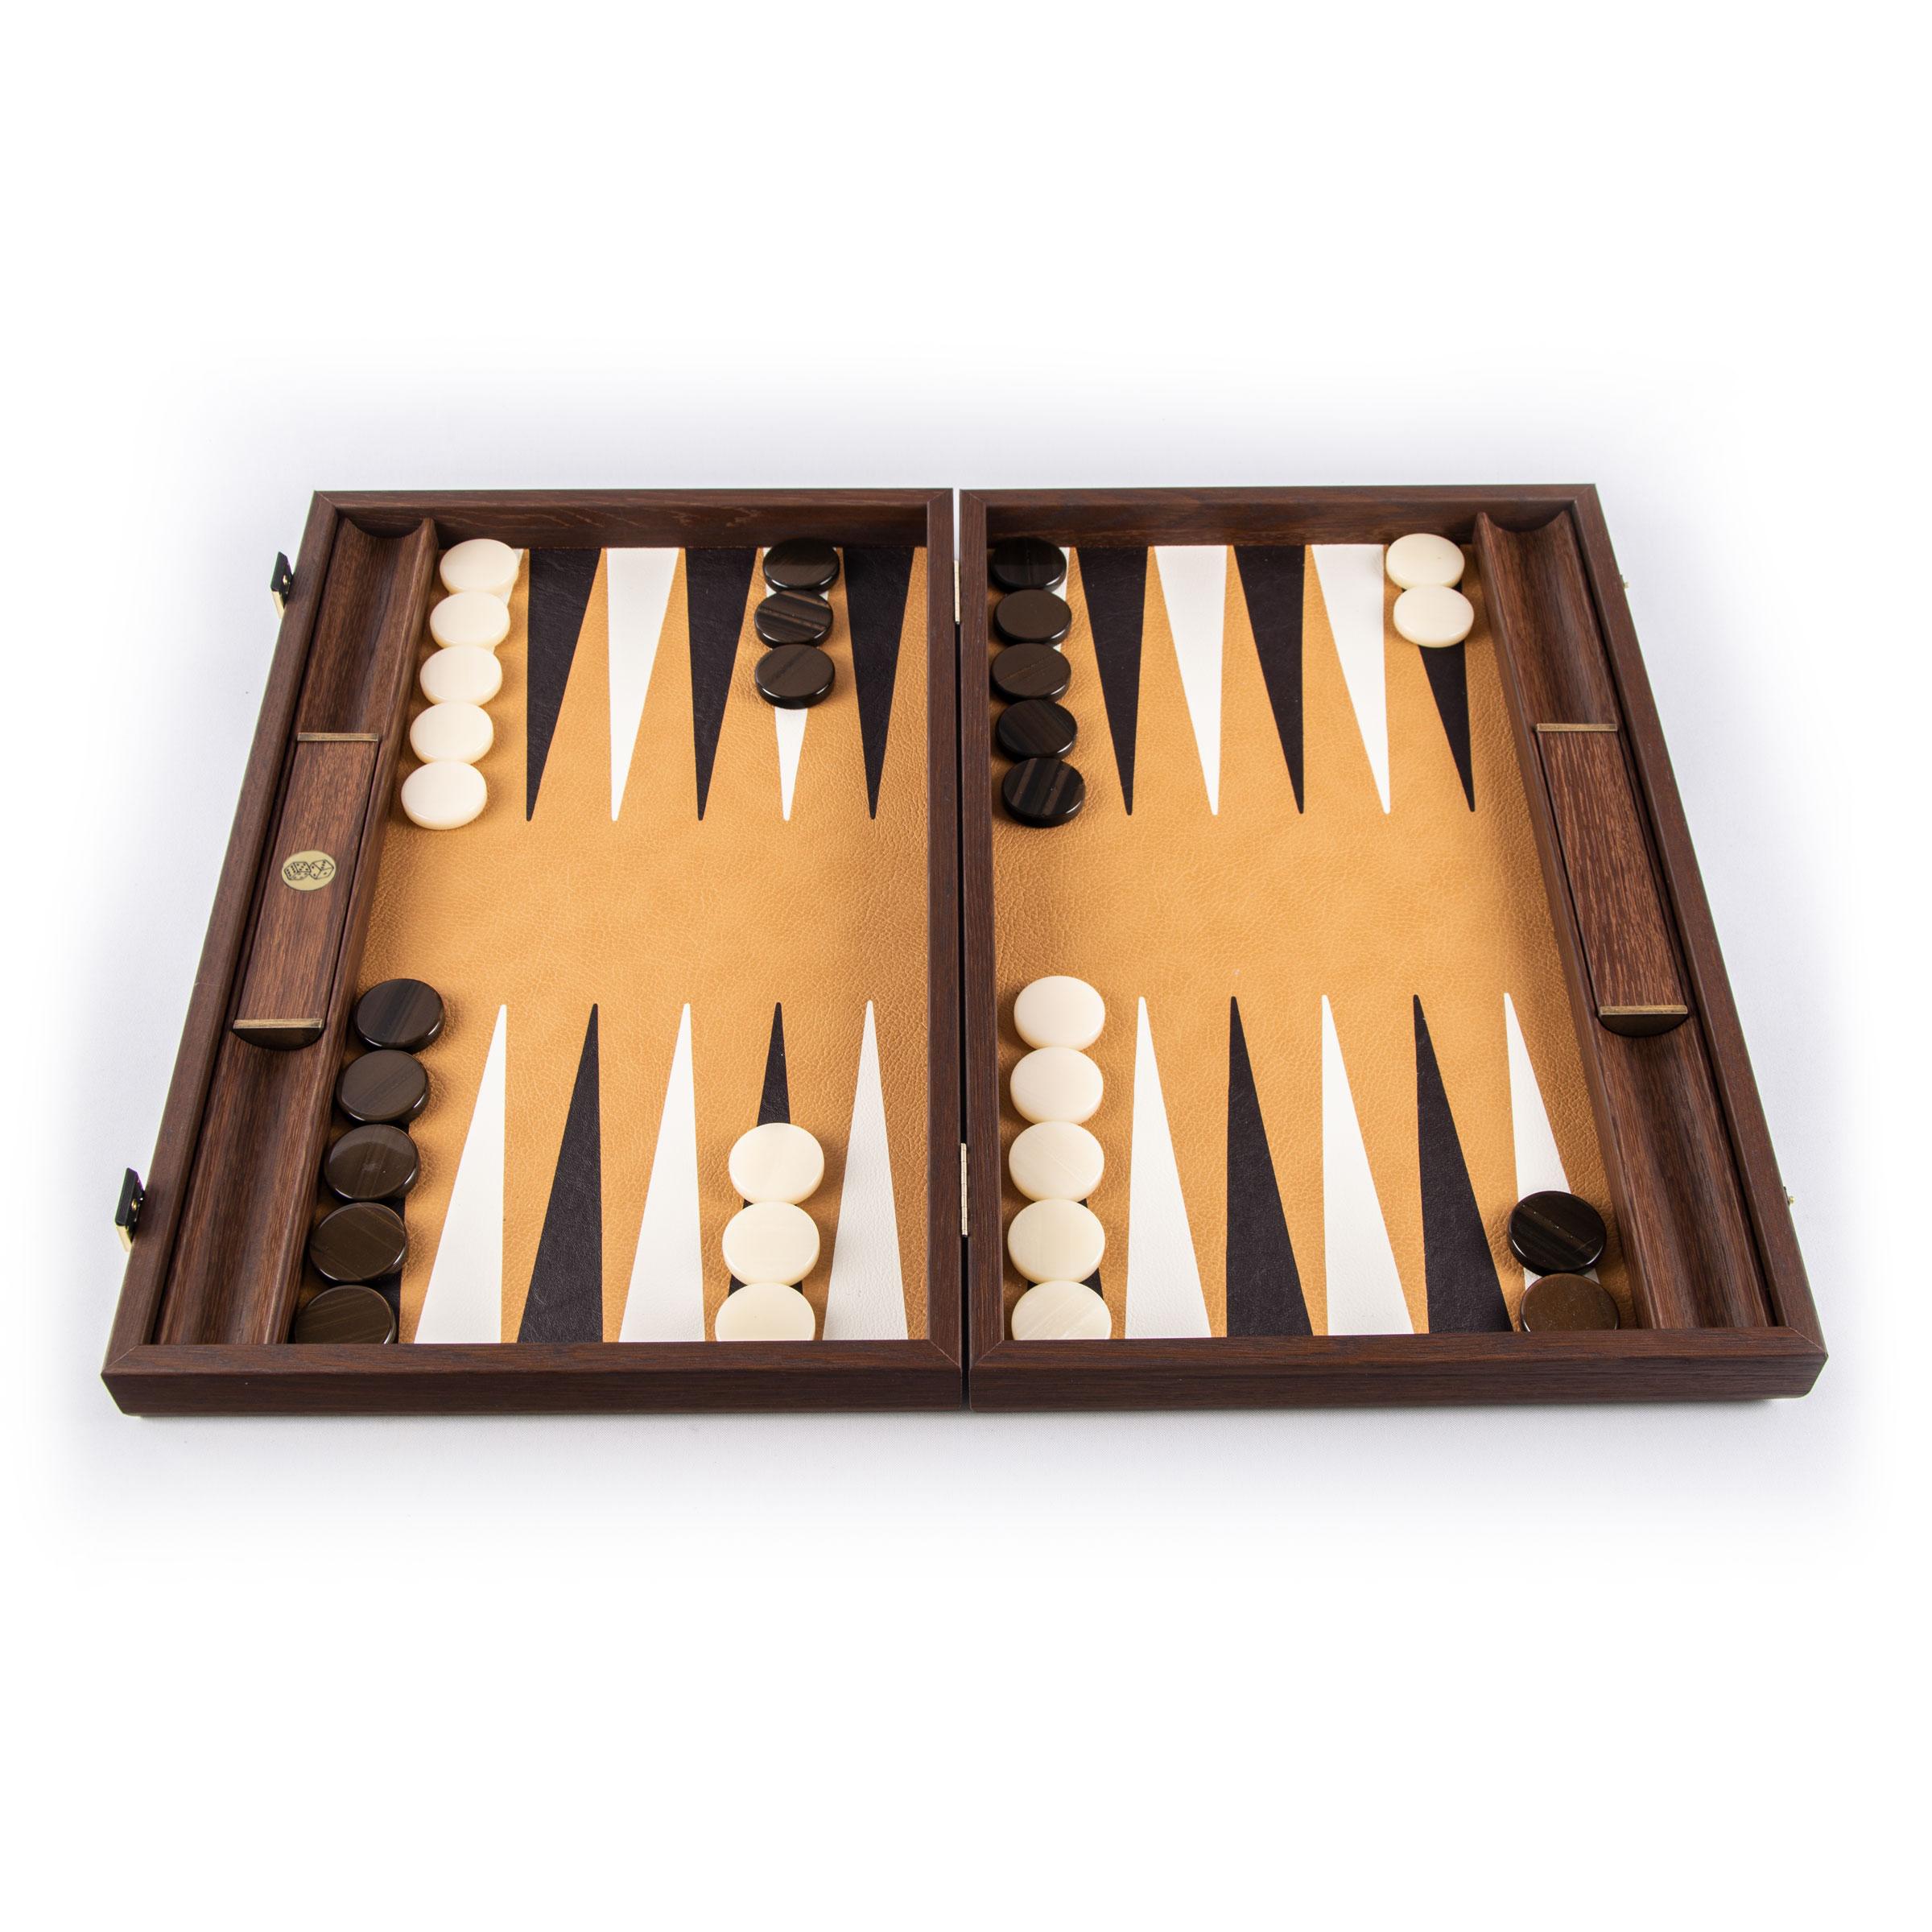 Dark Brown Wood backgammon set 19 inches tournament